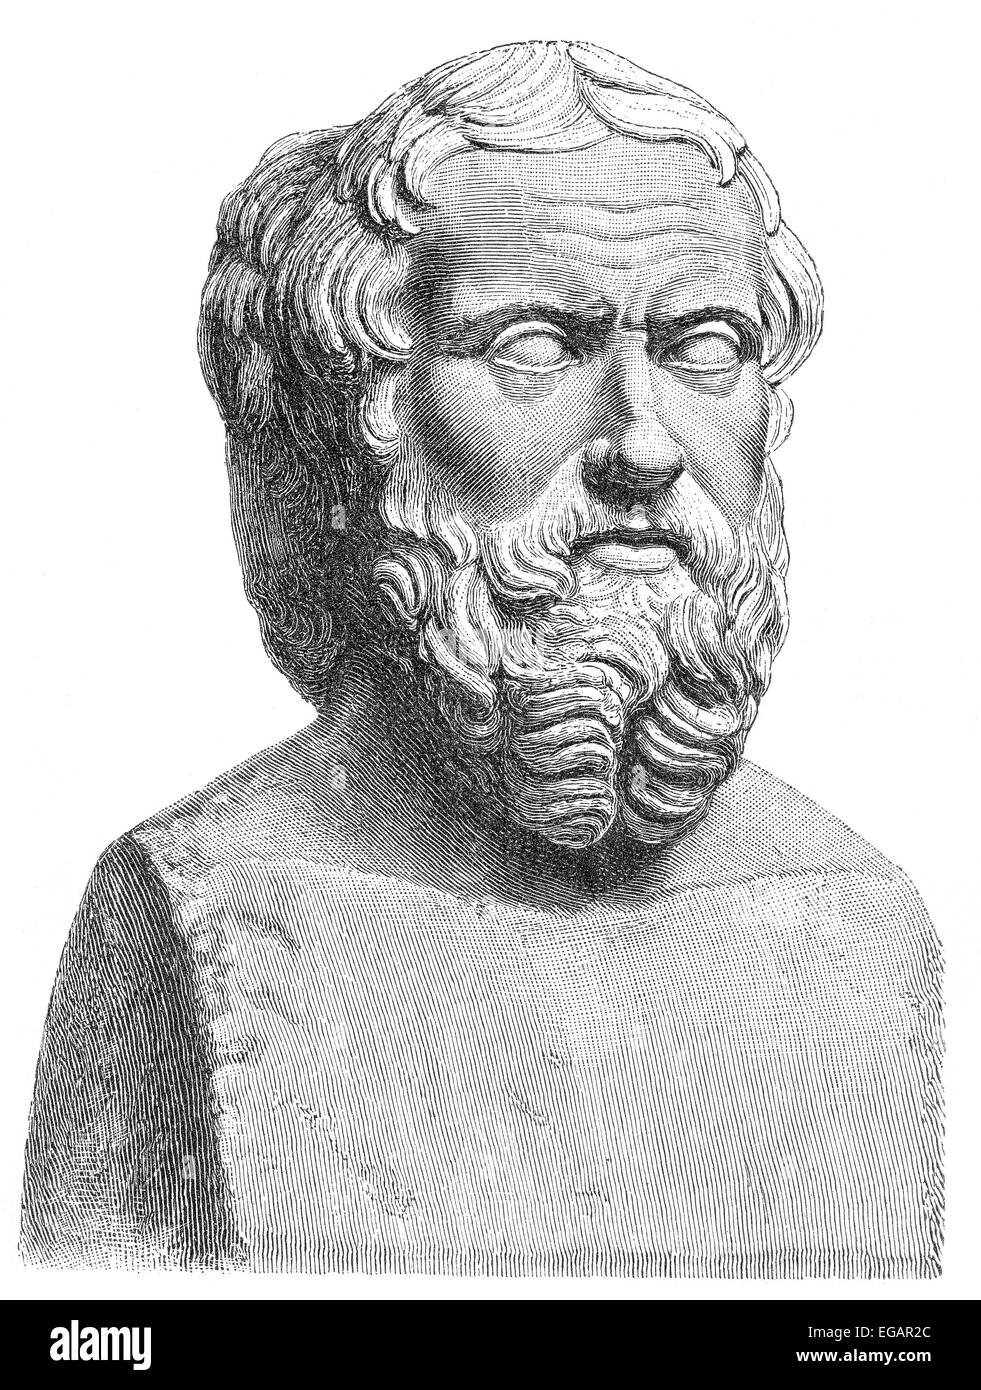 Herodotus of Halicarnassus, 490-480 BC - around 424 BC, an ancient Greek historian, geographer and ethnographer, - Stock Image